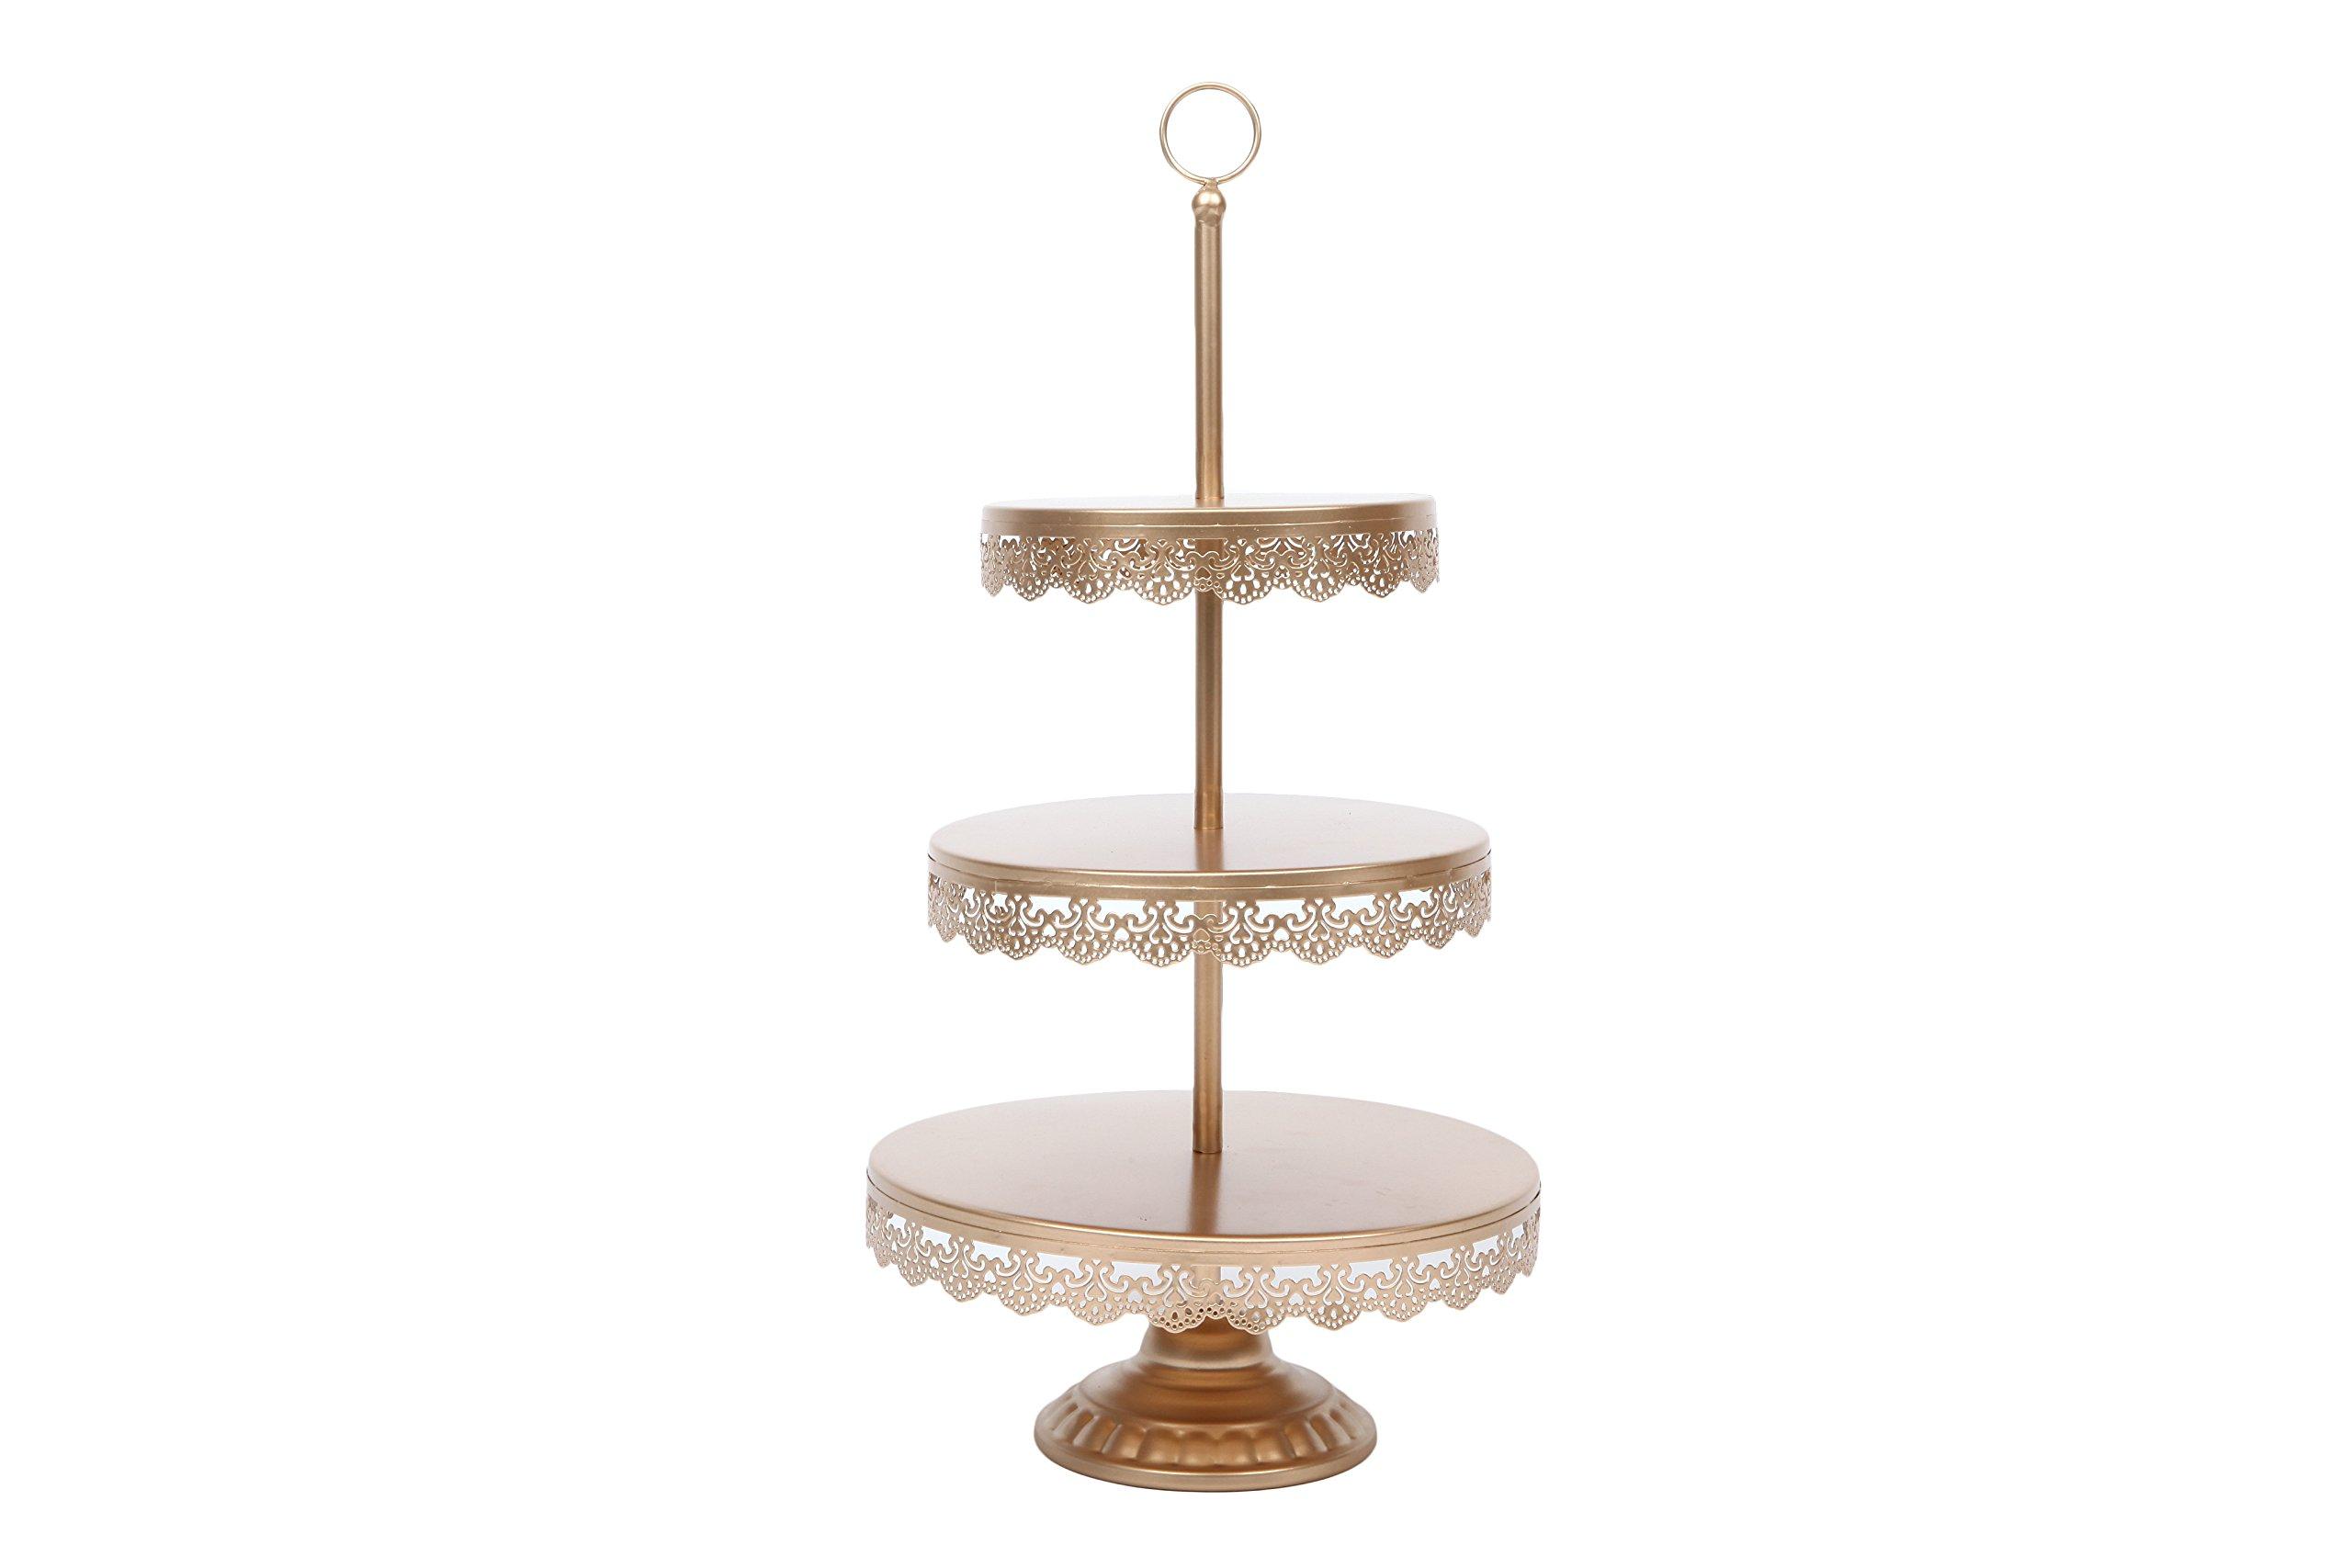 Lilac Beauty 3-tier Round Cupcake Stand Dessert Tower Display Iron Cupcake Holder for Wedding Birthday Anniversary Celebration